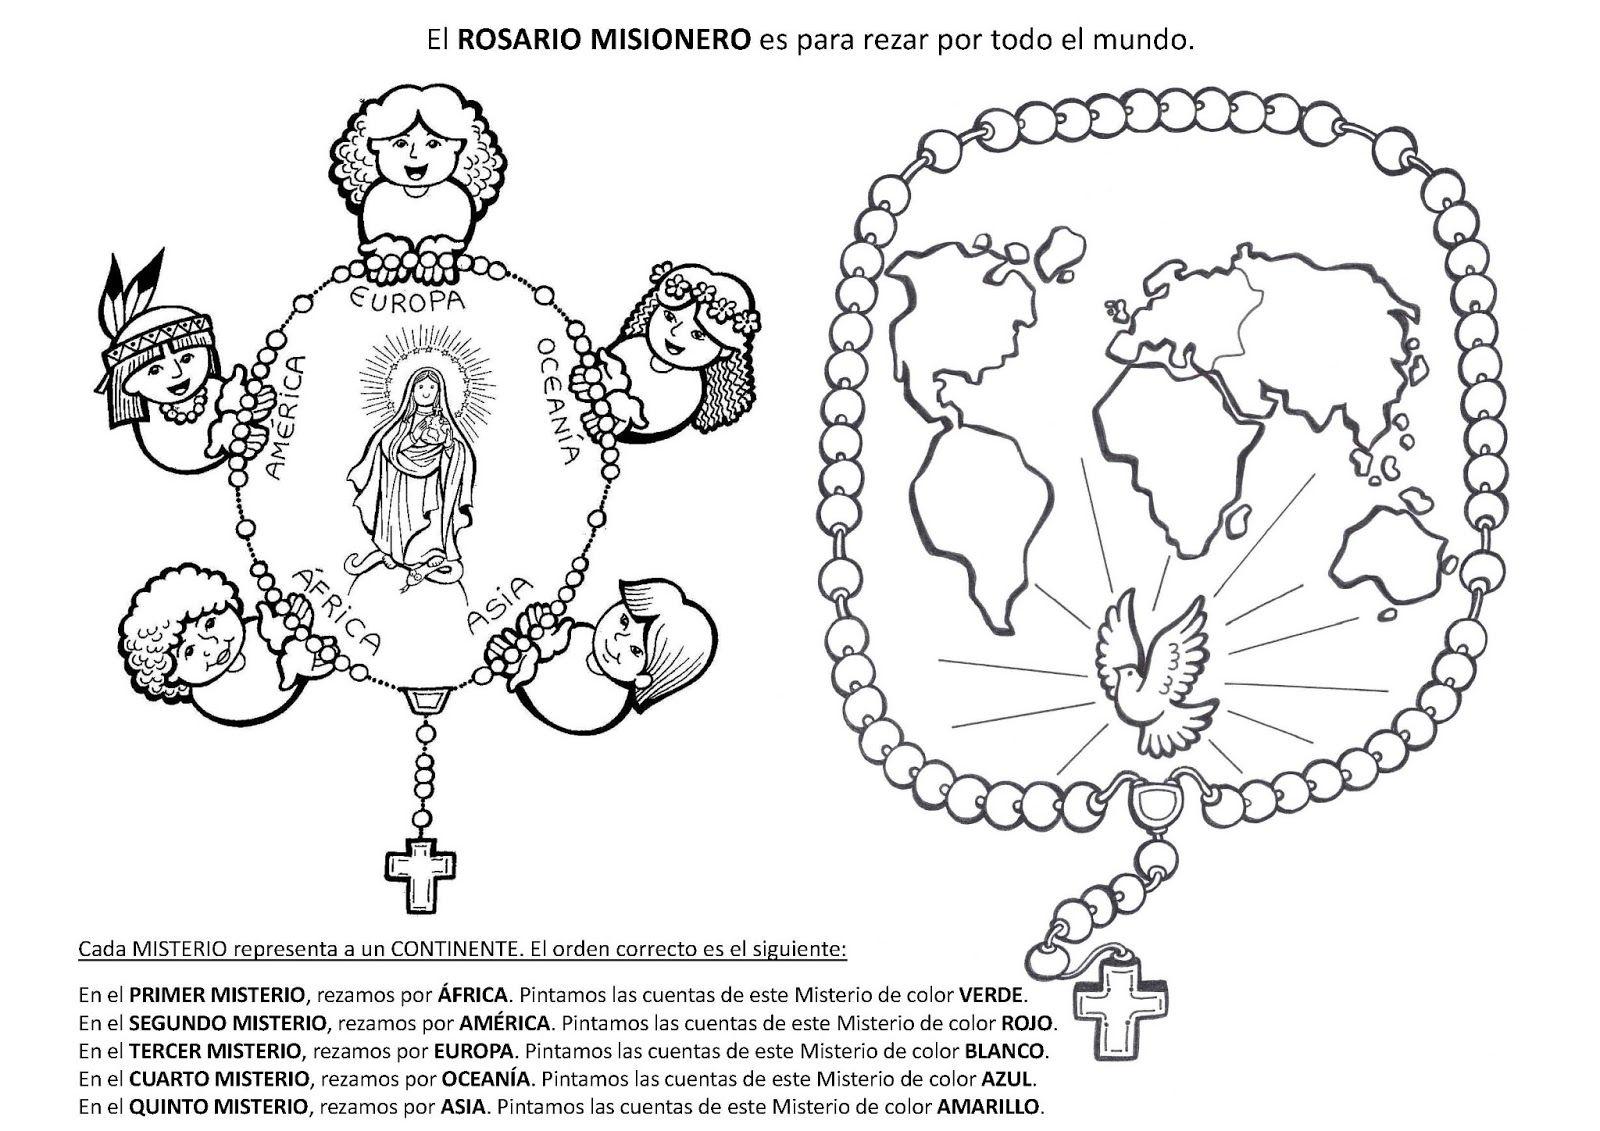 Rosario Misionero Rosario Misionero Rosarios Misionero